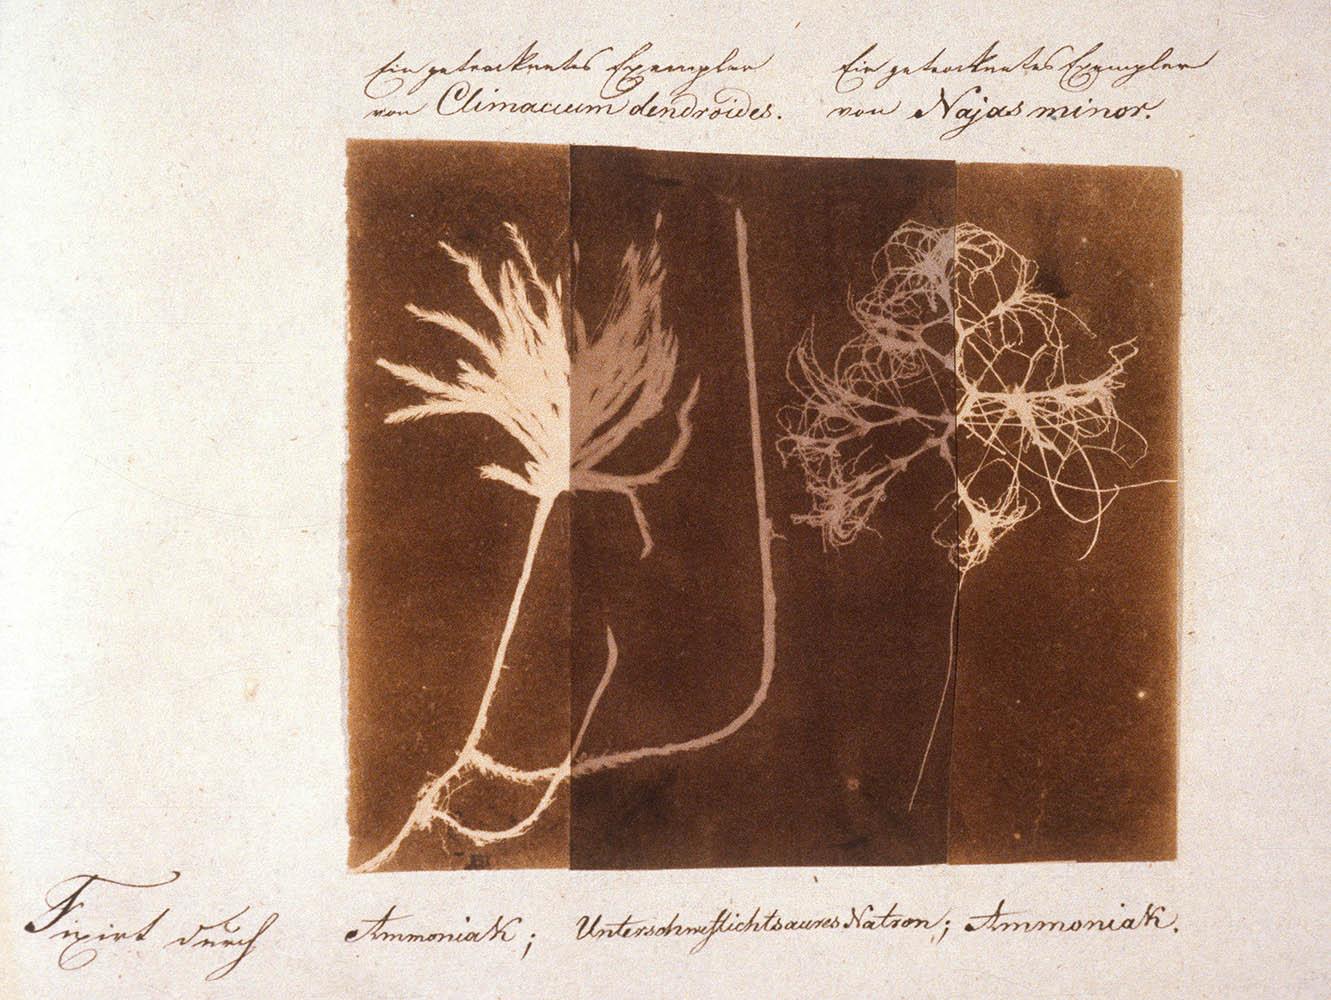 JuliusFritzsche-may1839-russia